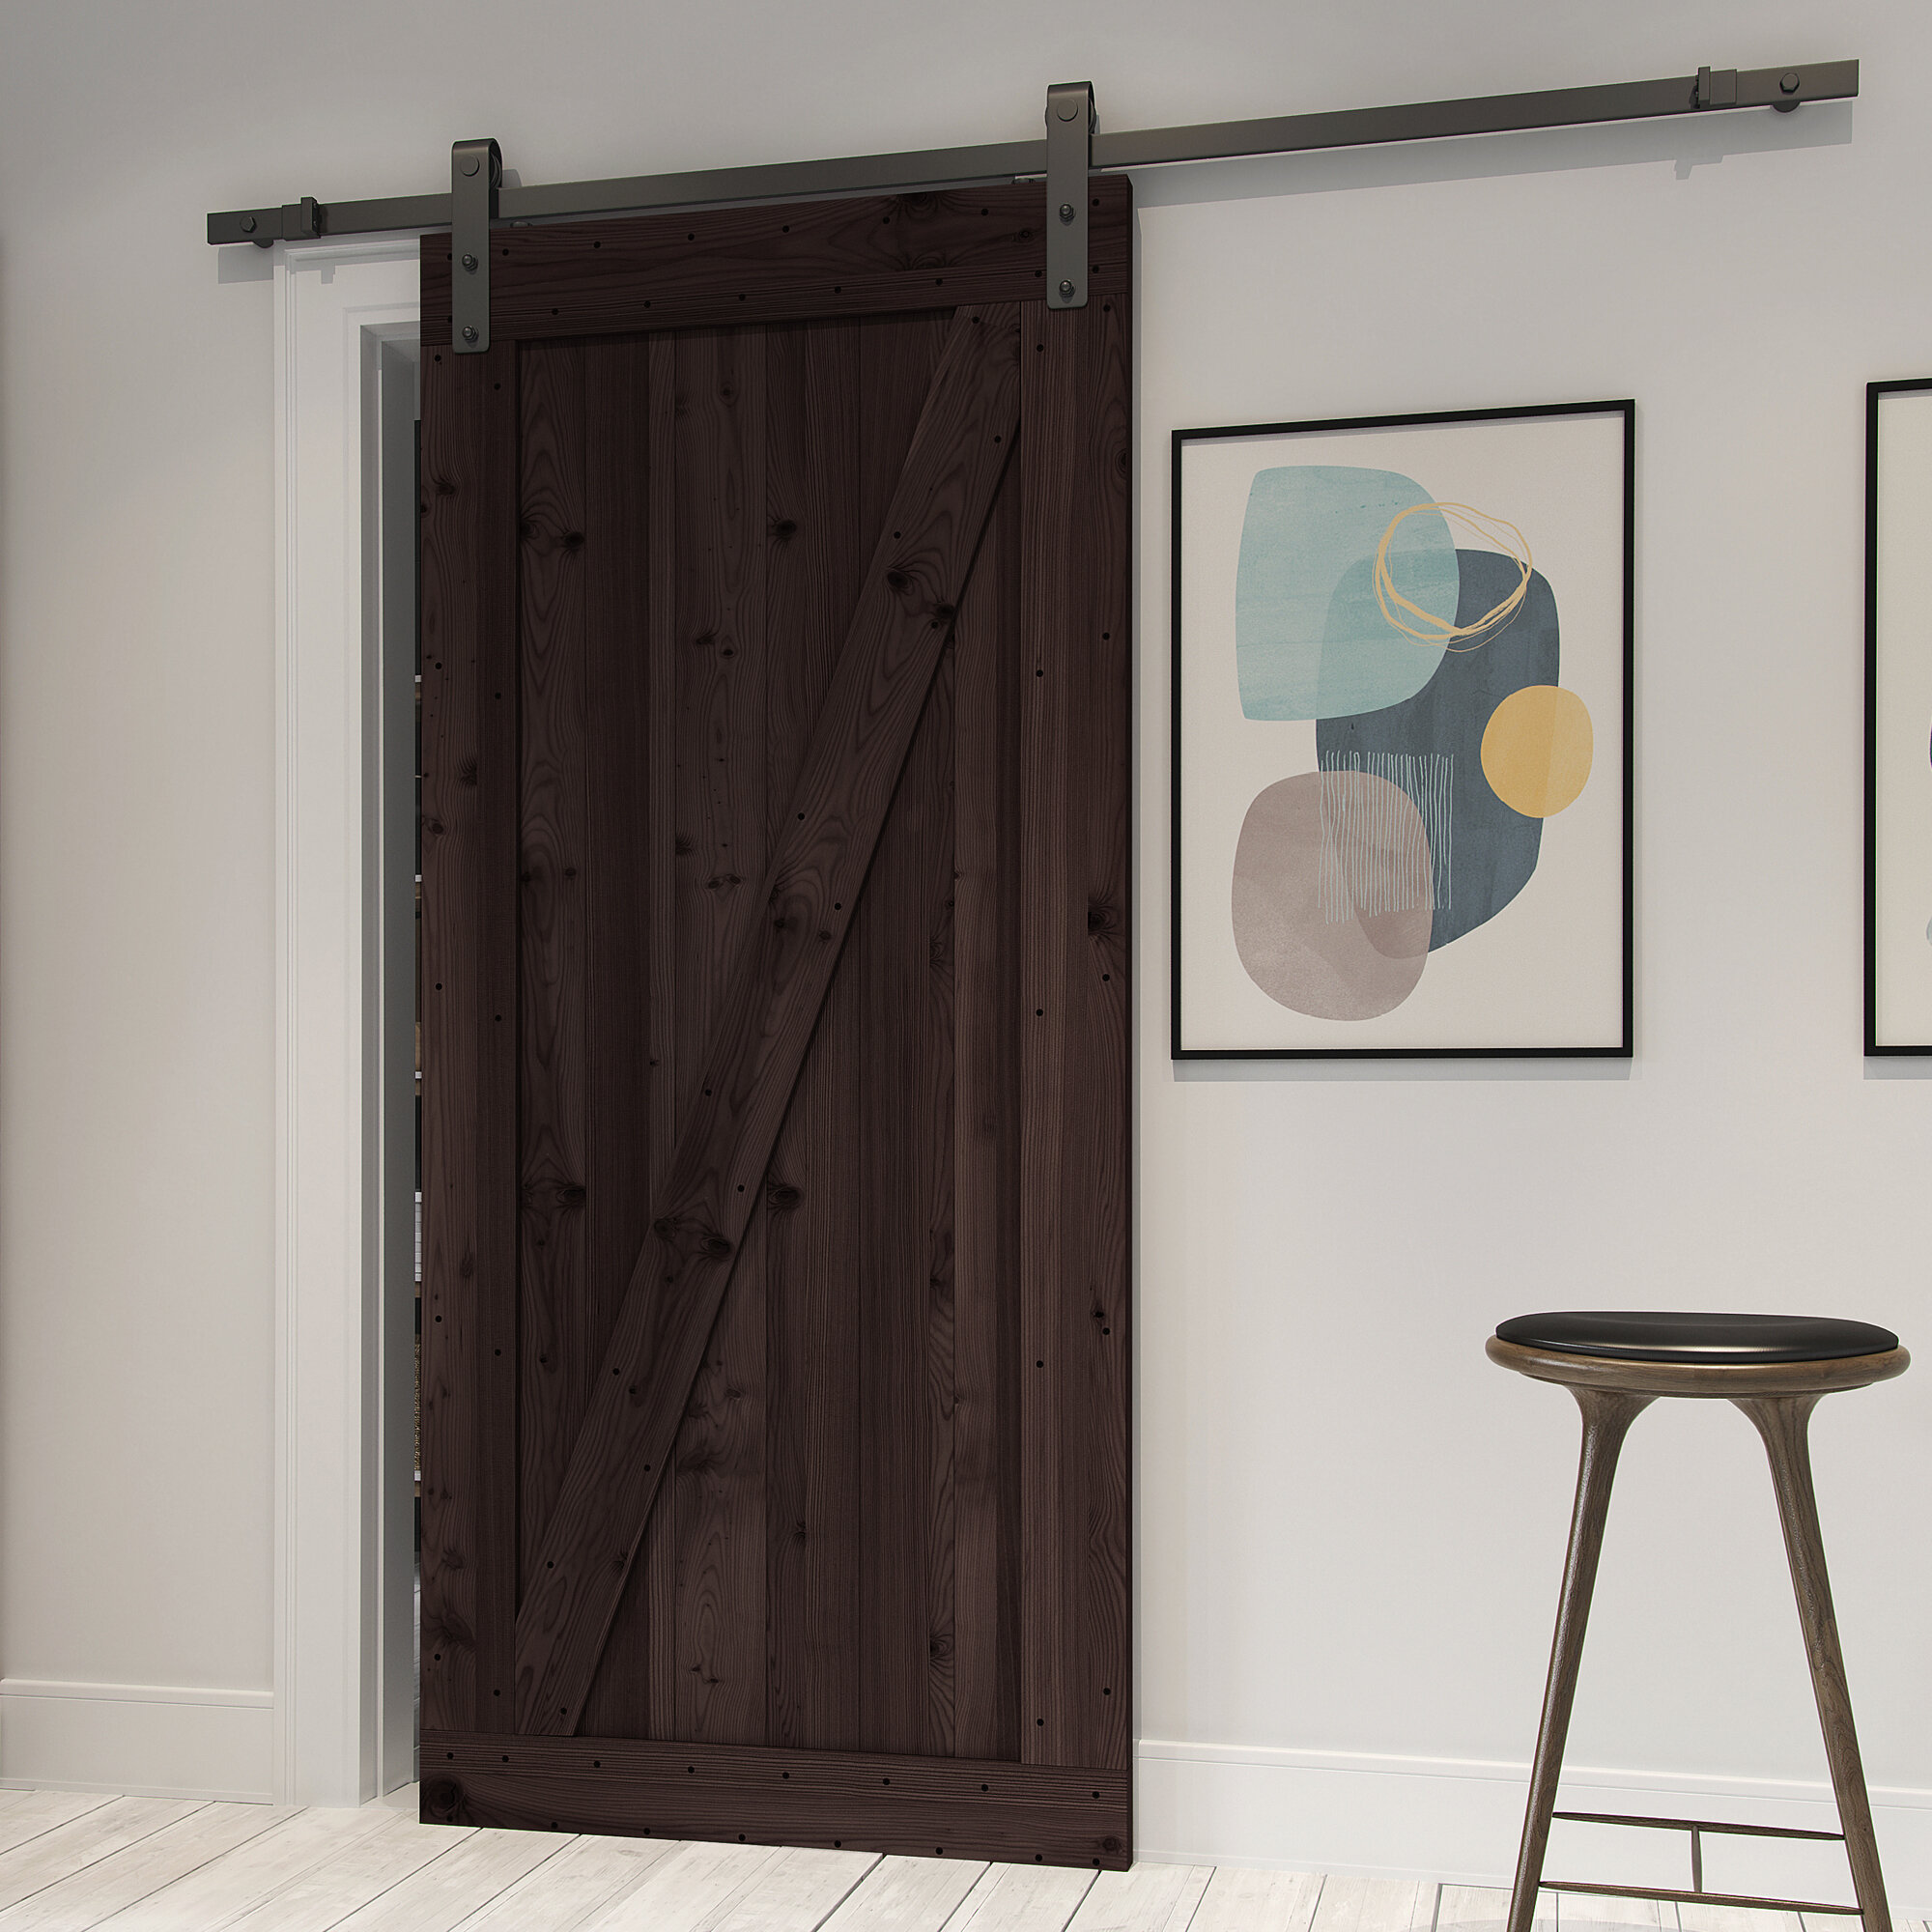 Northbeam Paneled Wood Finish Prehung Barn Door With Installation Hardware Kit Reviews Wayfair